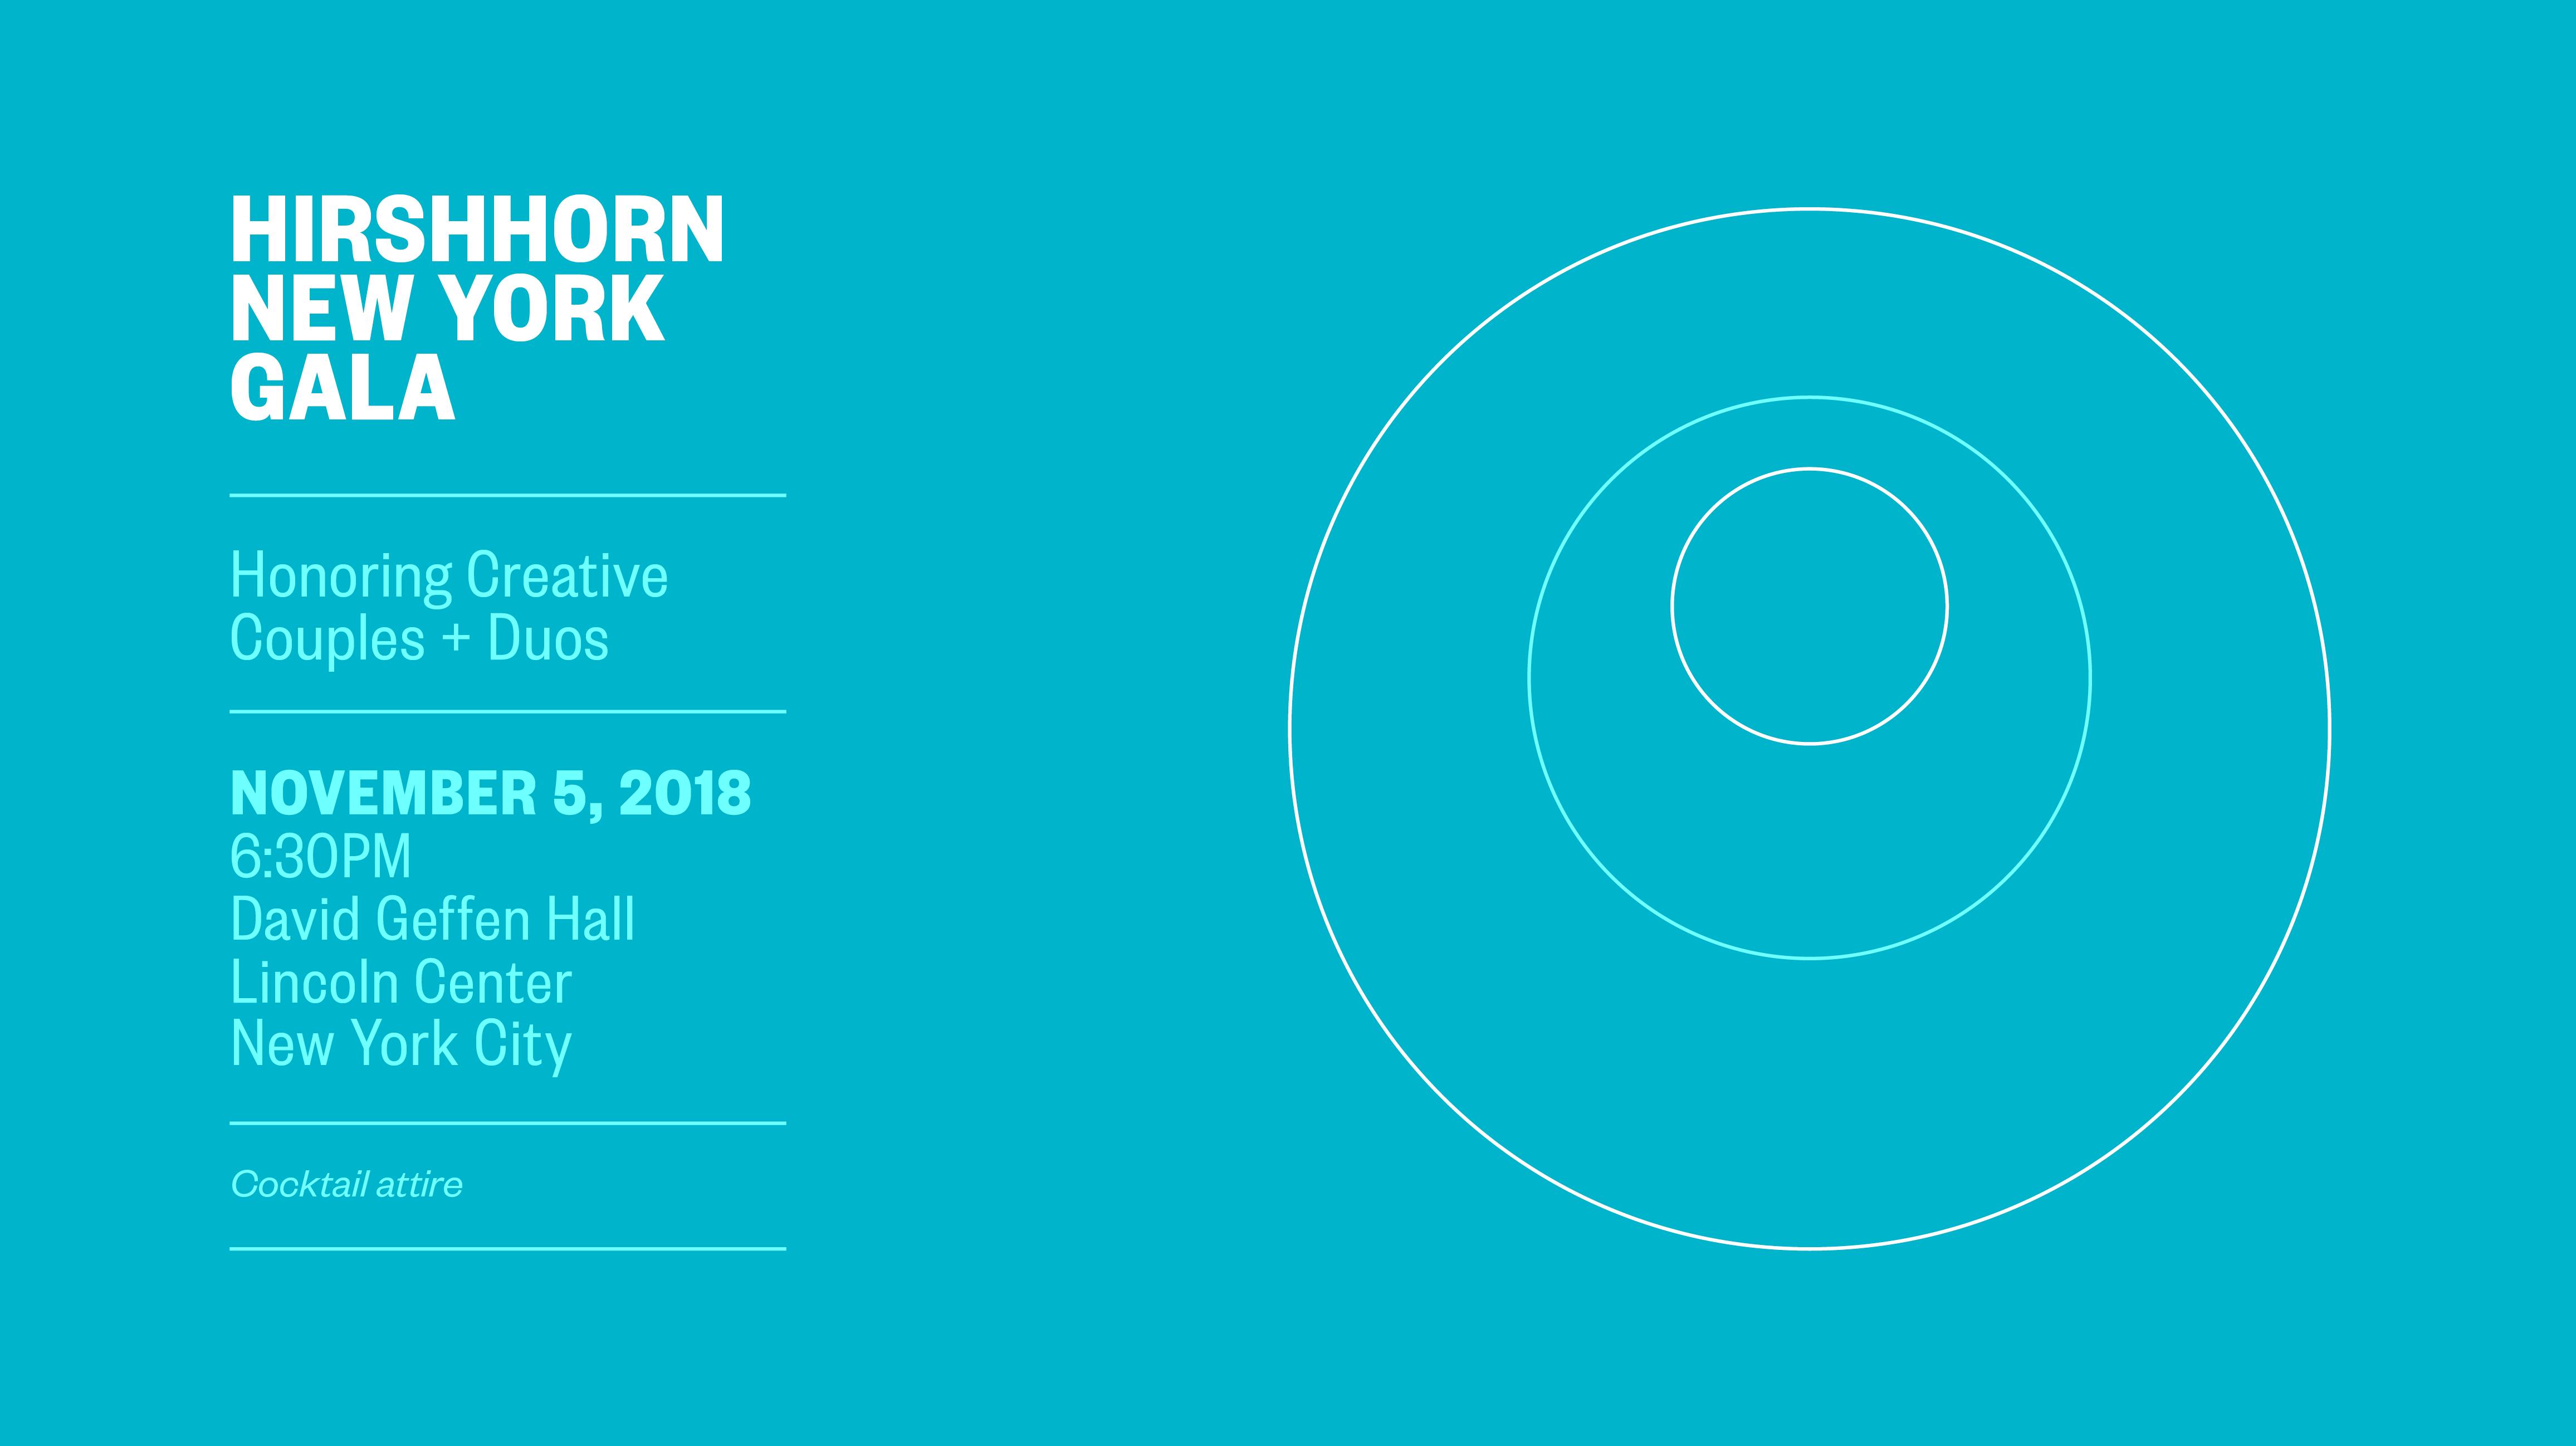 Hirshhorn New York Gala